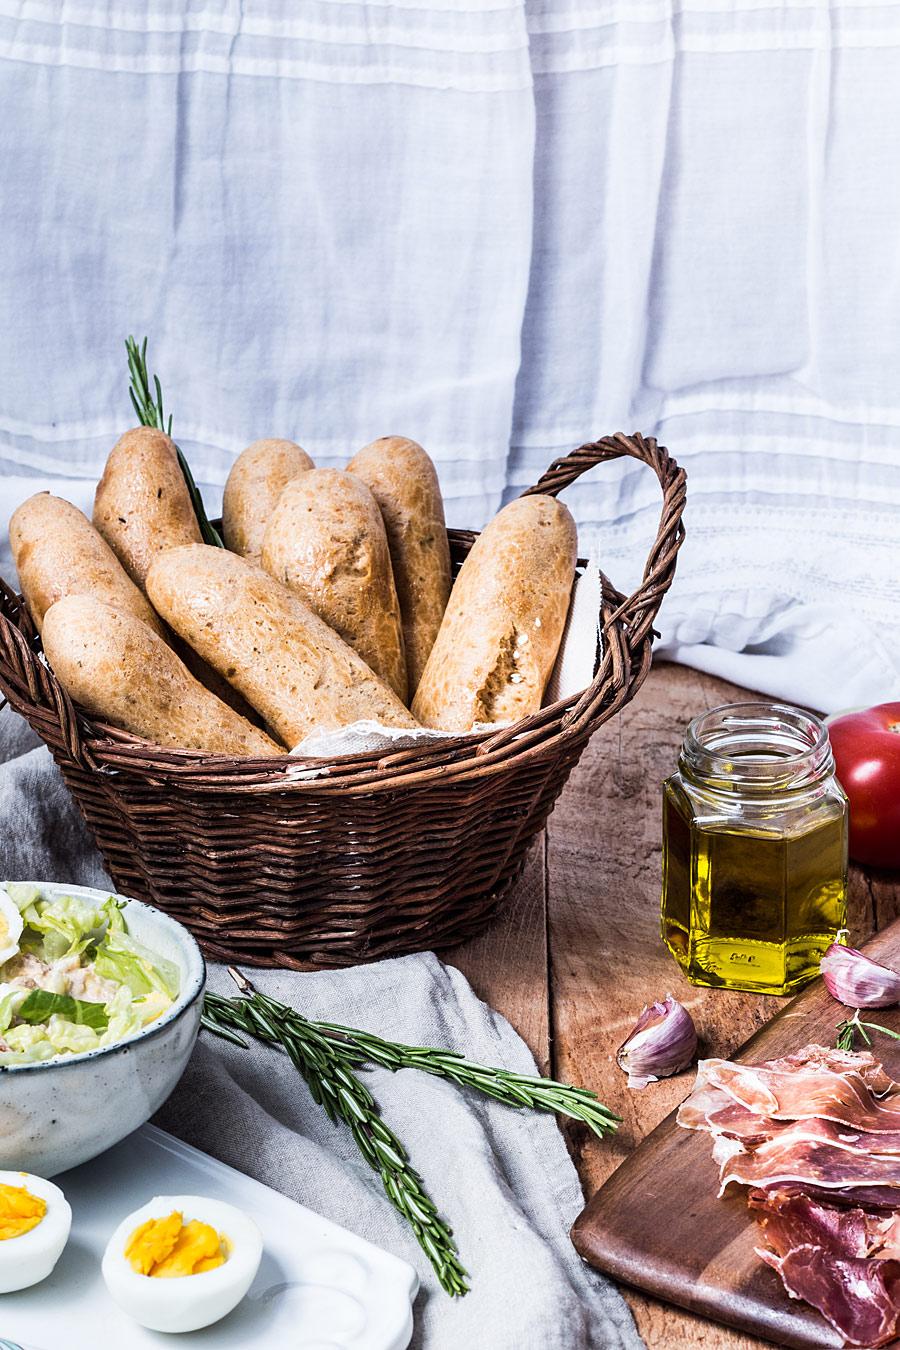 Spanish tapas sandwiches  (Paleo | Gluten free) | Lau Sunday cooks .jpg